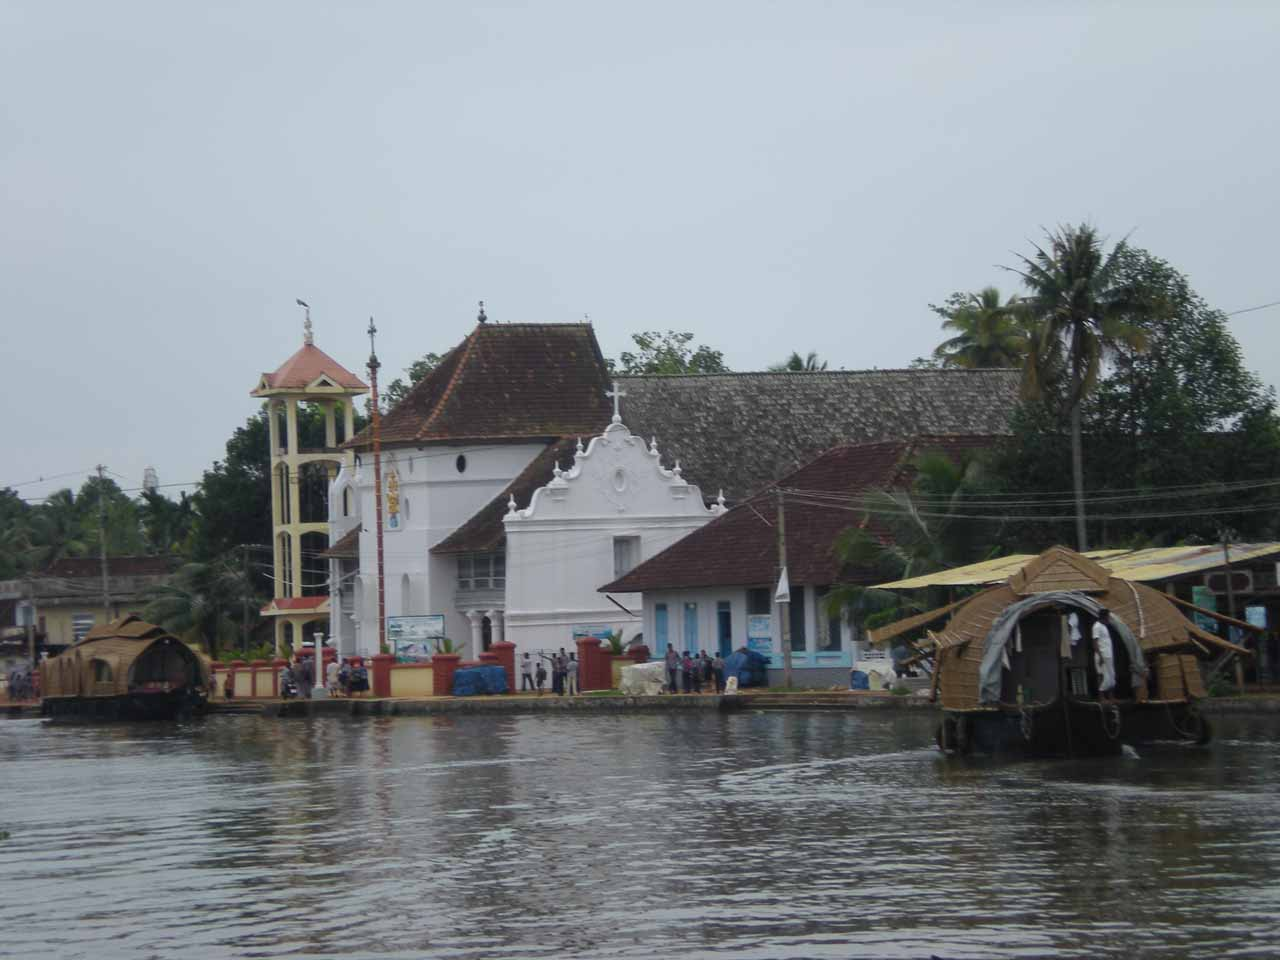 Docking near some catholic church